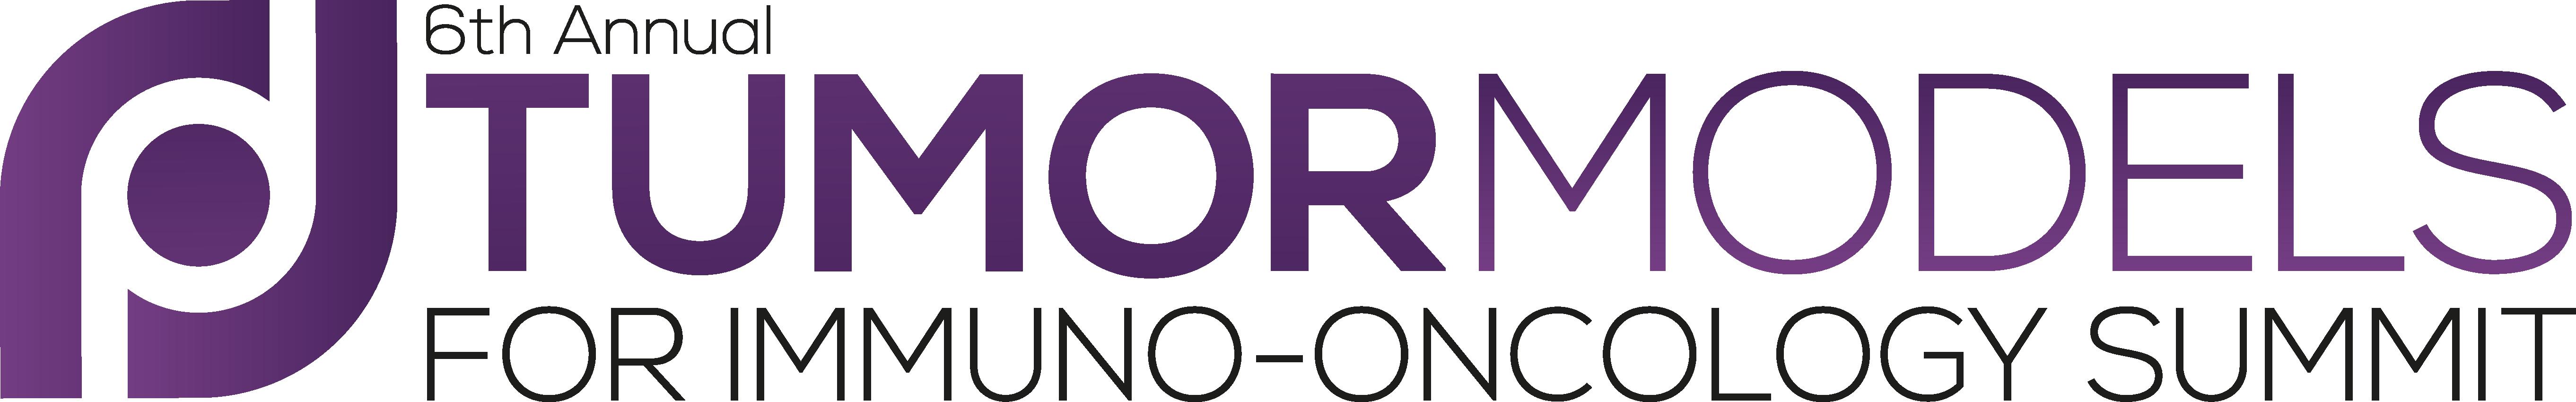 6th Tumor Models for Immuno-Oncology Summit logo